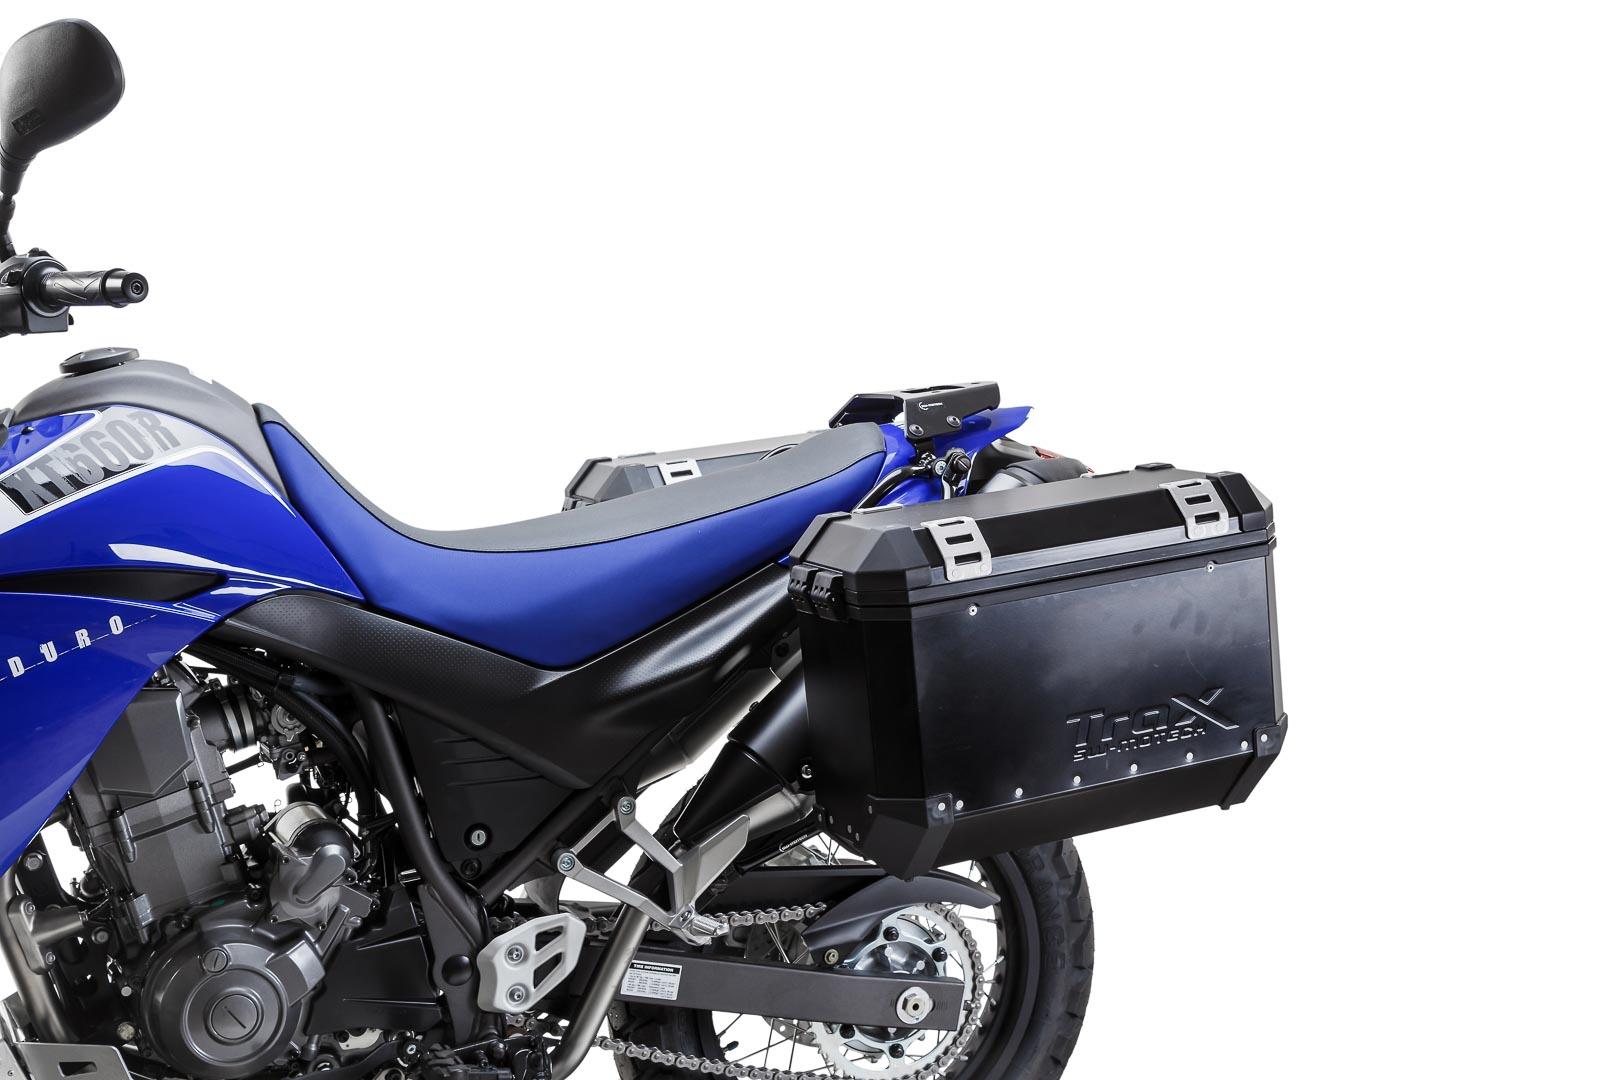 SW-Motech Quick-Lock Evo sivutelinesarja Yamaha XT660